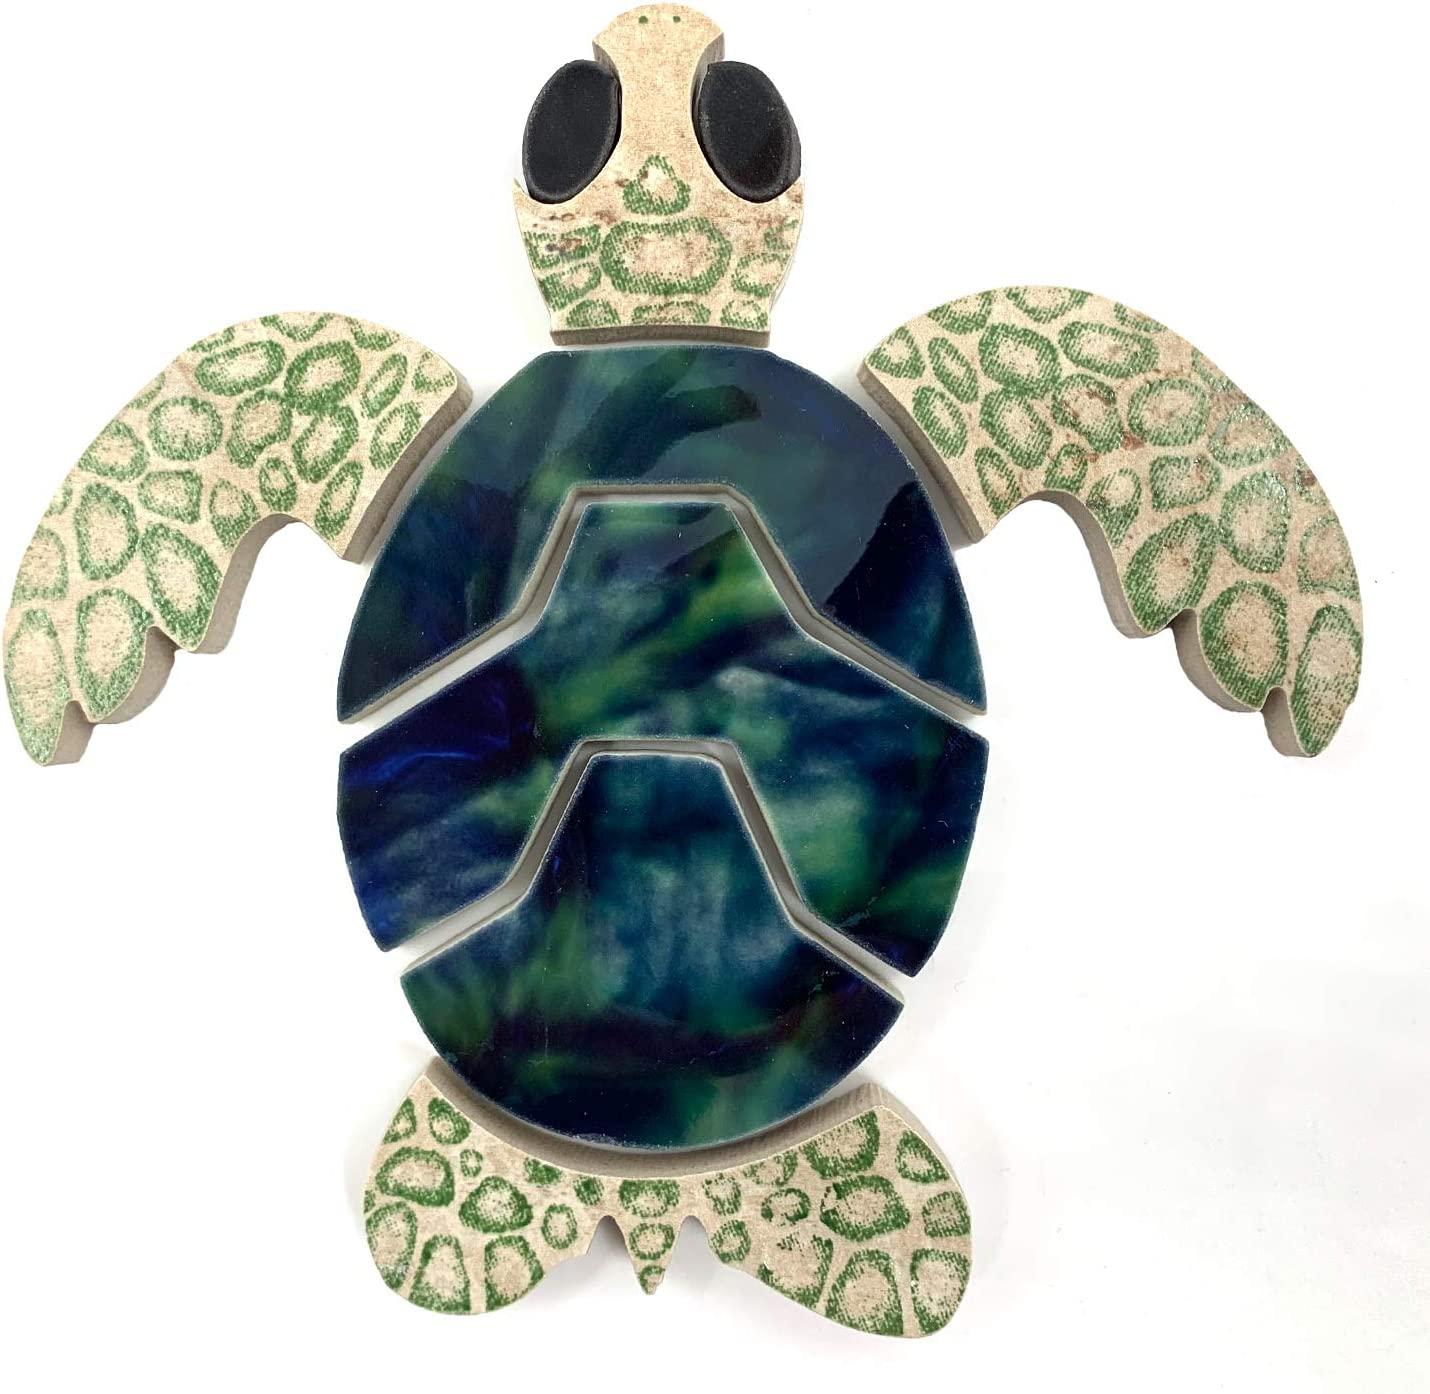 Aquatic Custom Tile Small 6